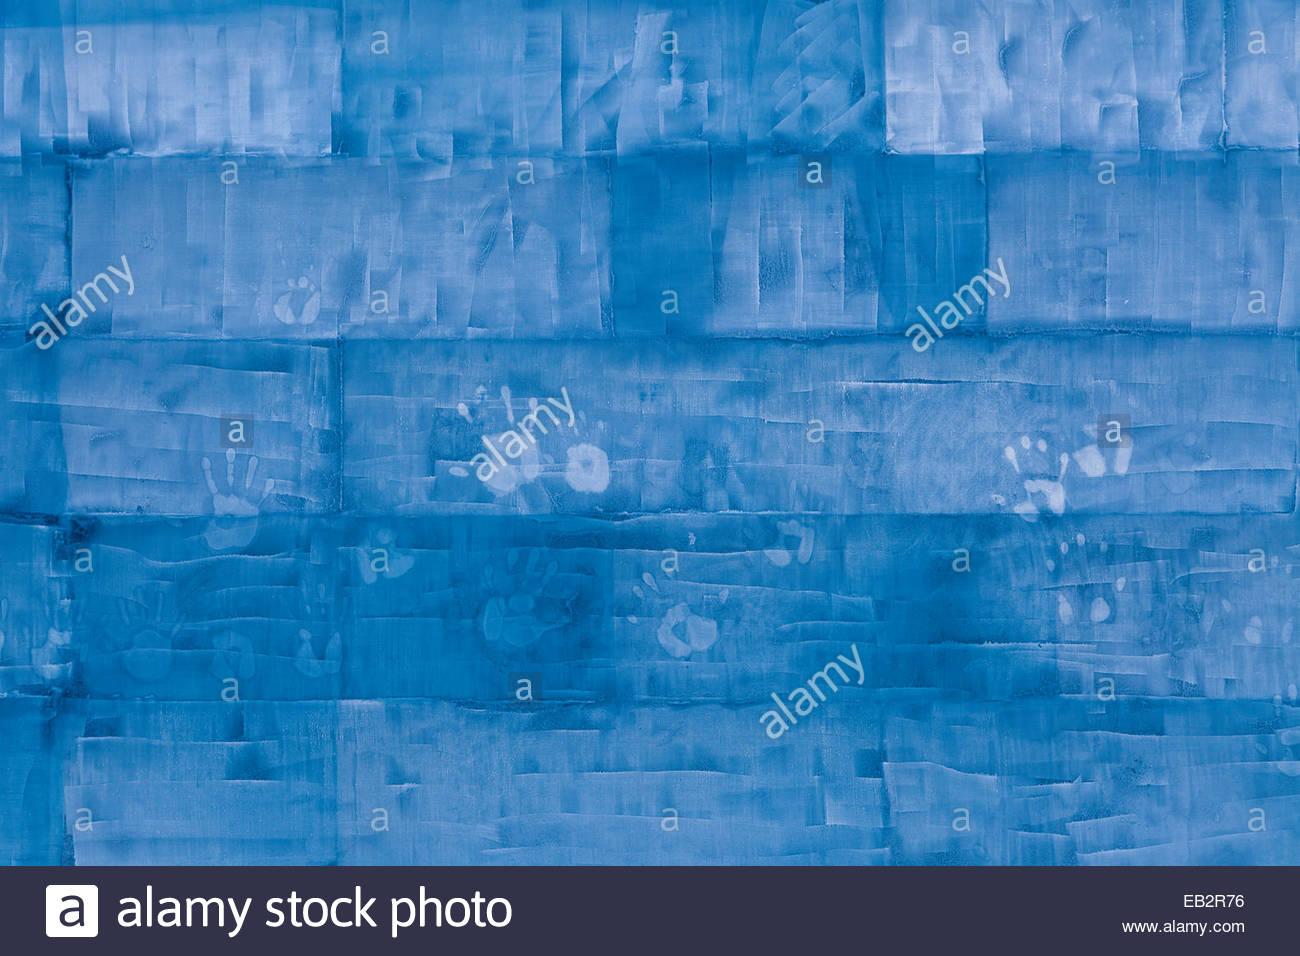 Blaue Eisblöcke trägt menschliche Handabdrücke gestapelt. Stockbild